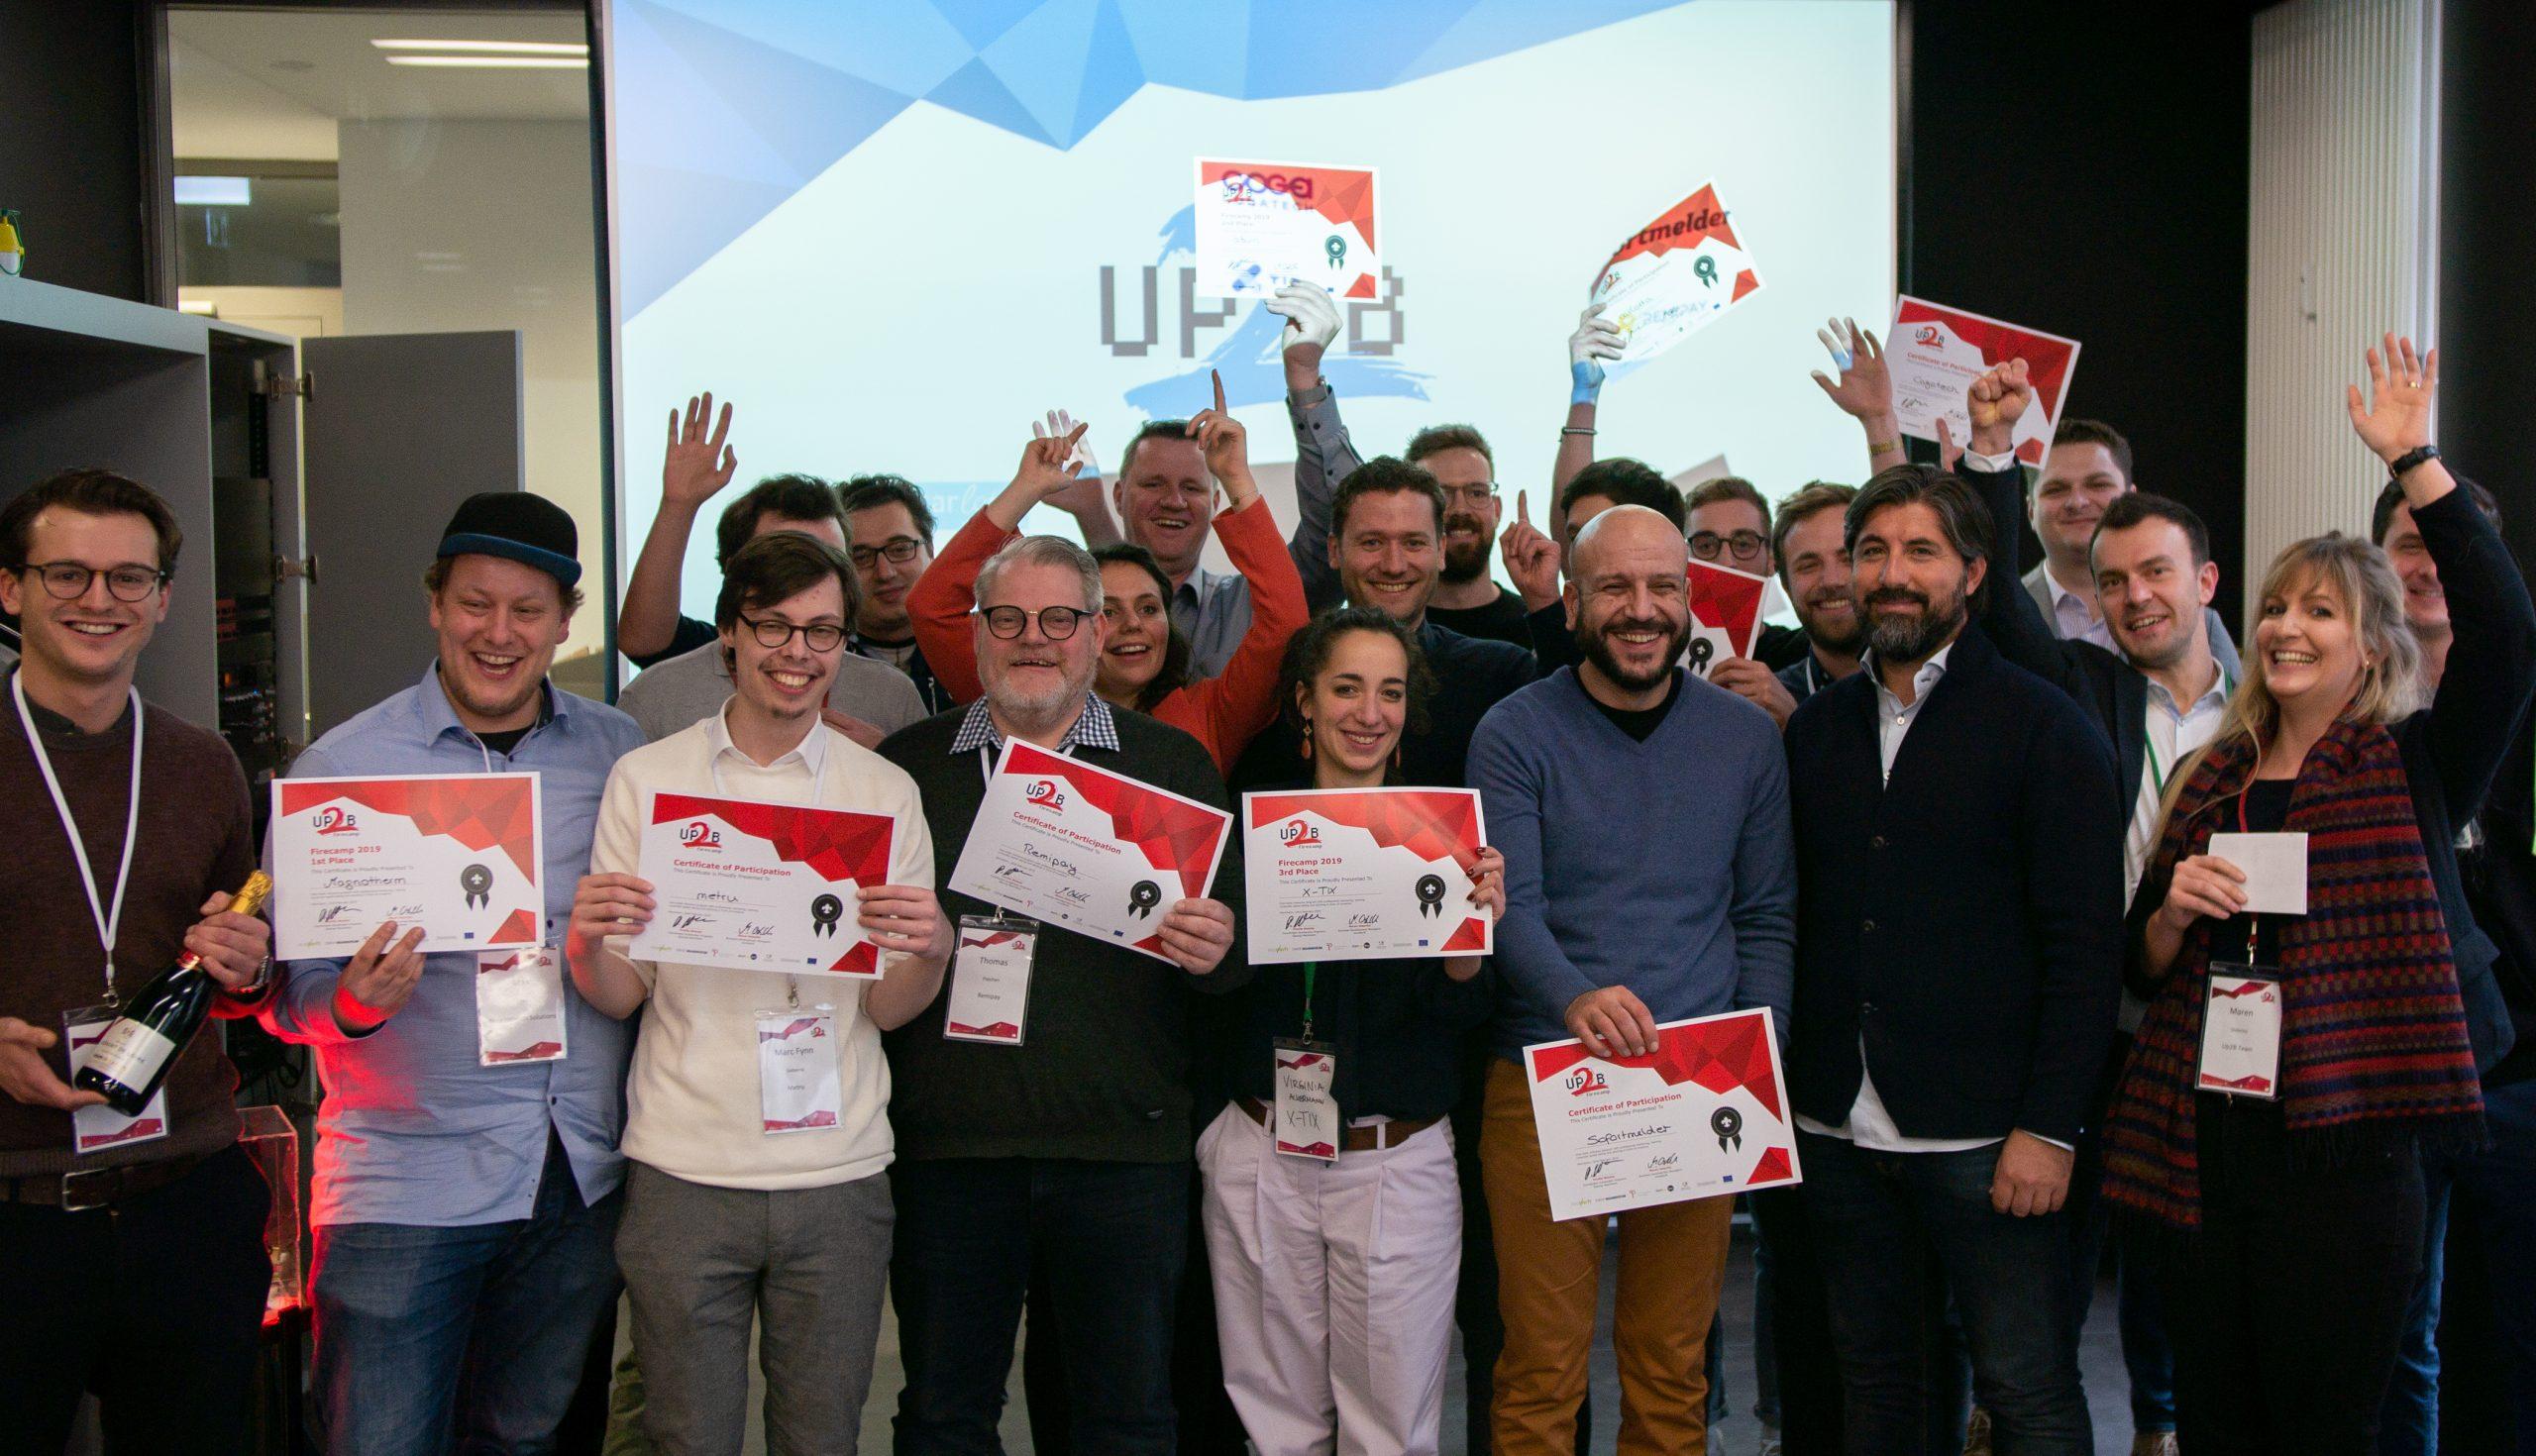 Up2B Firecamp - Finale 2019